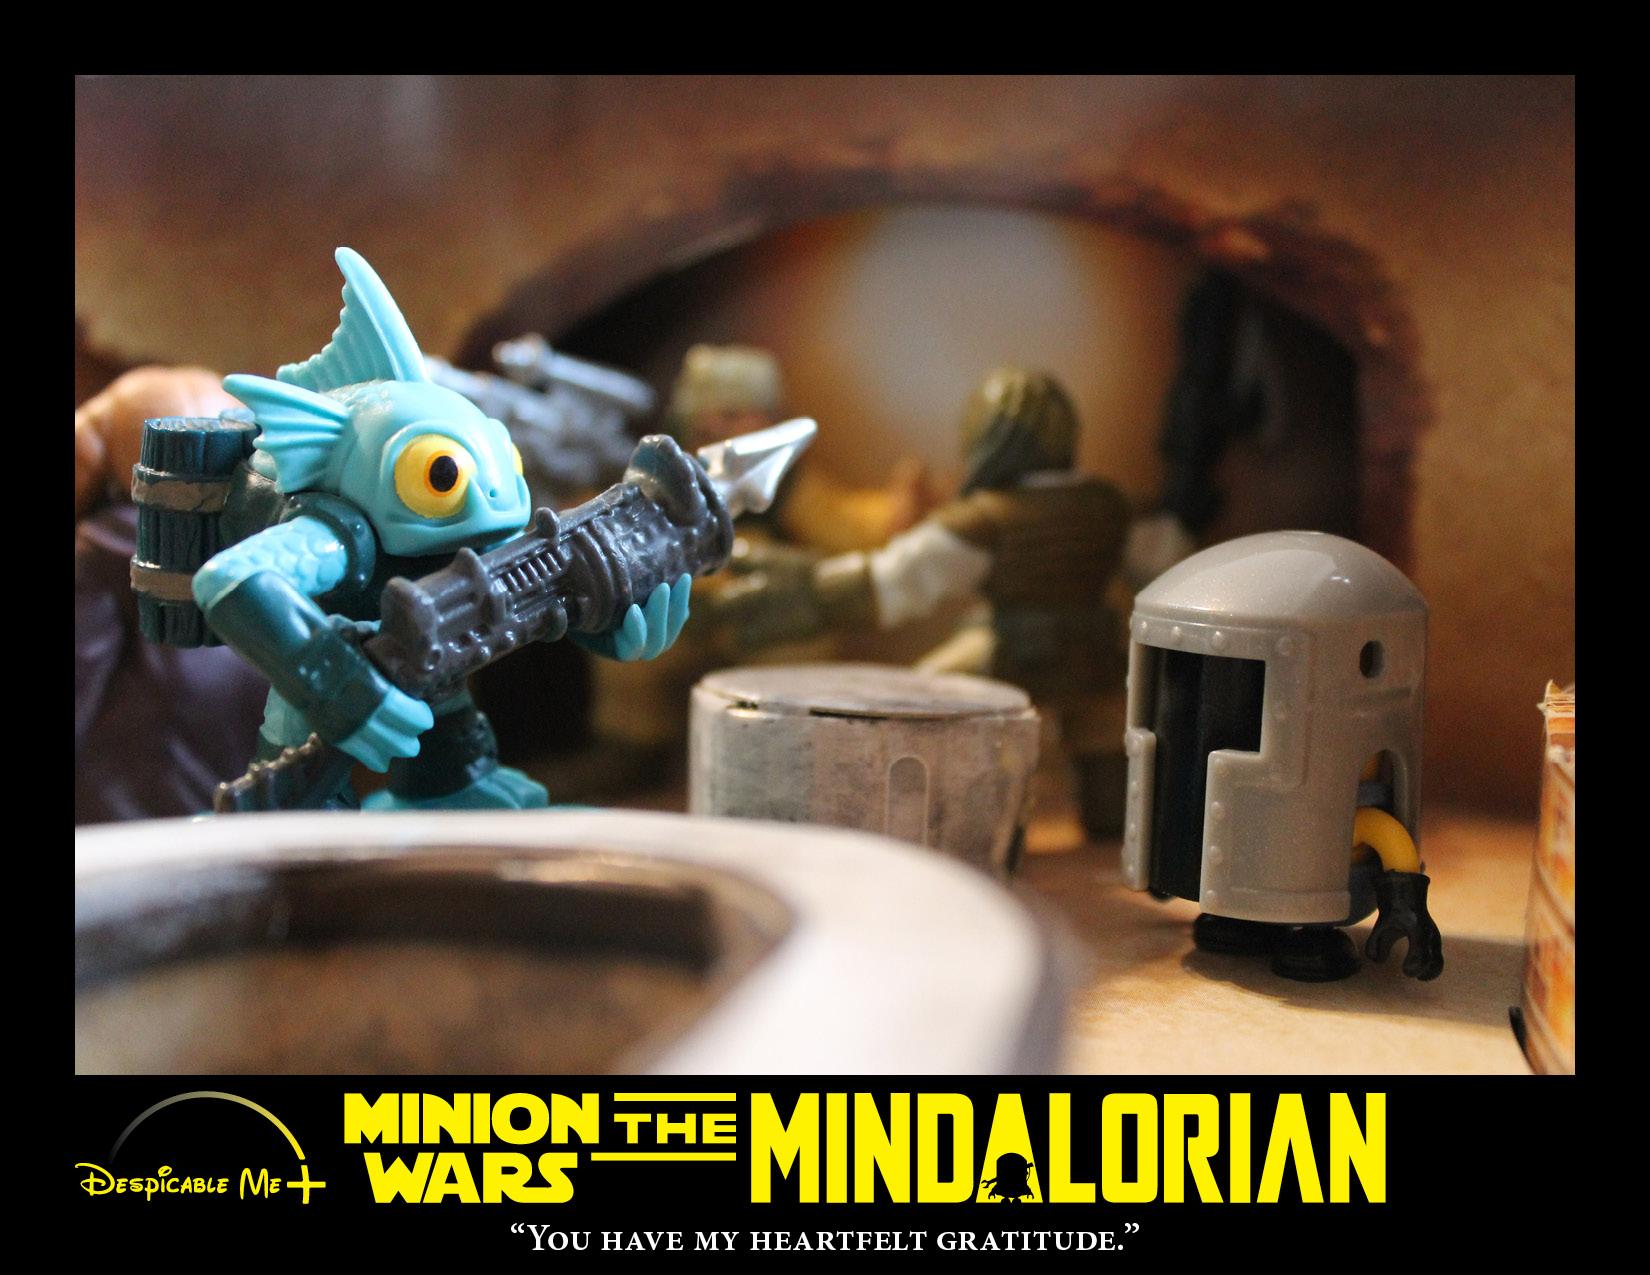 The Mindalorian encounters his bounty.